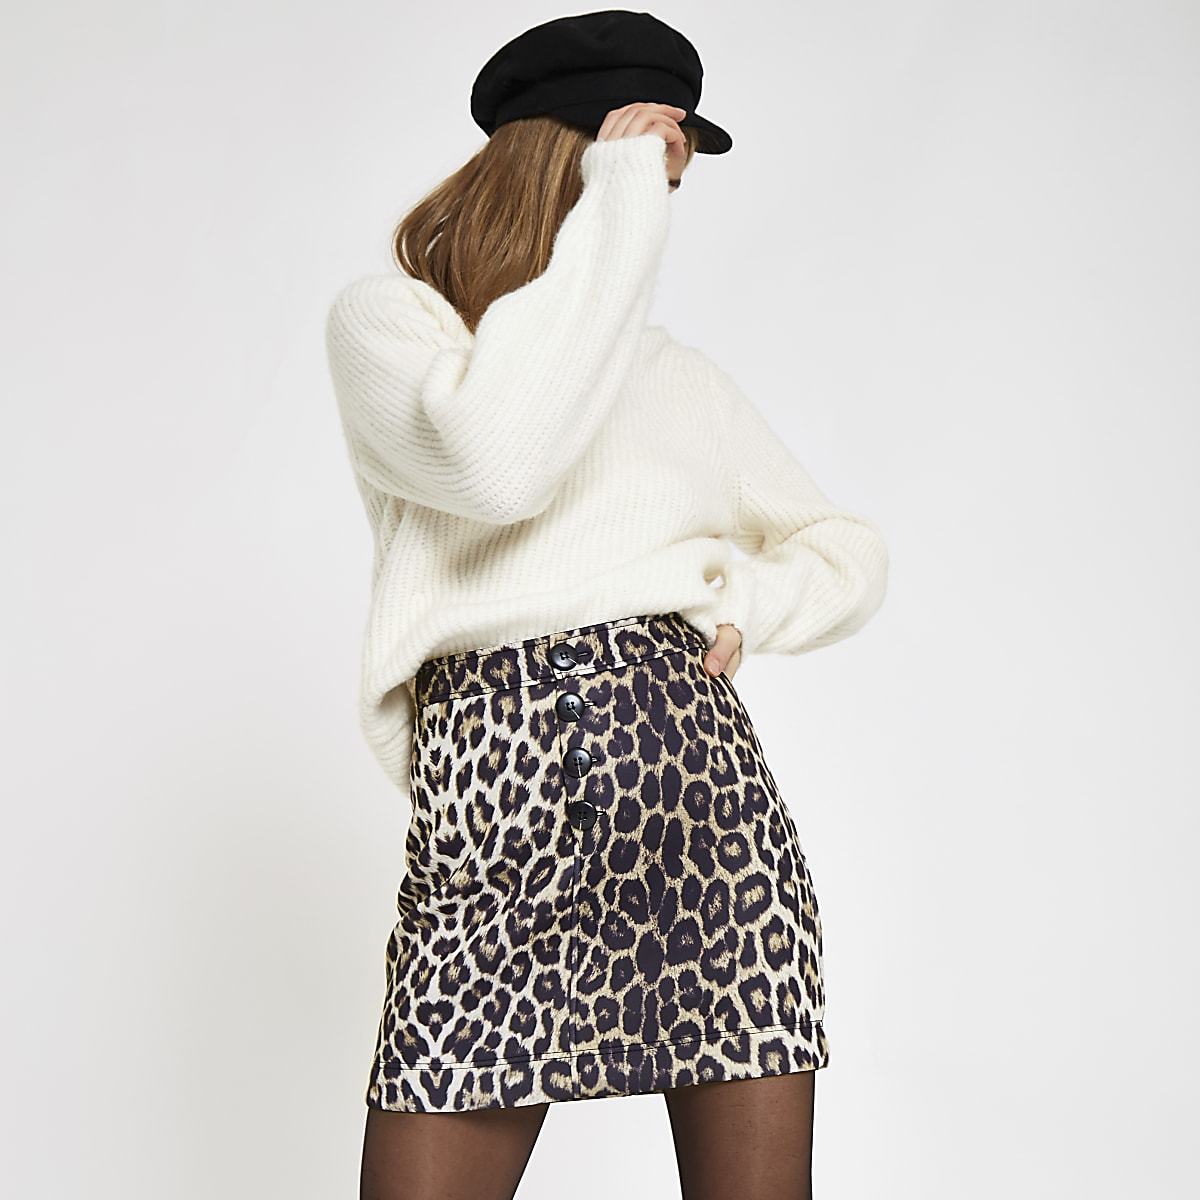 Beiger Minirock mit Leopardenprint